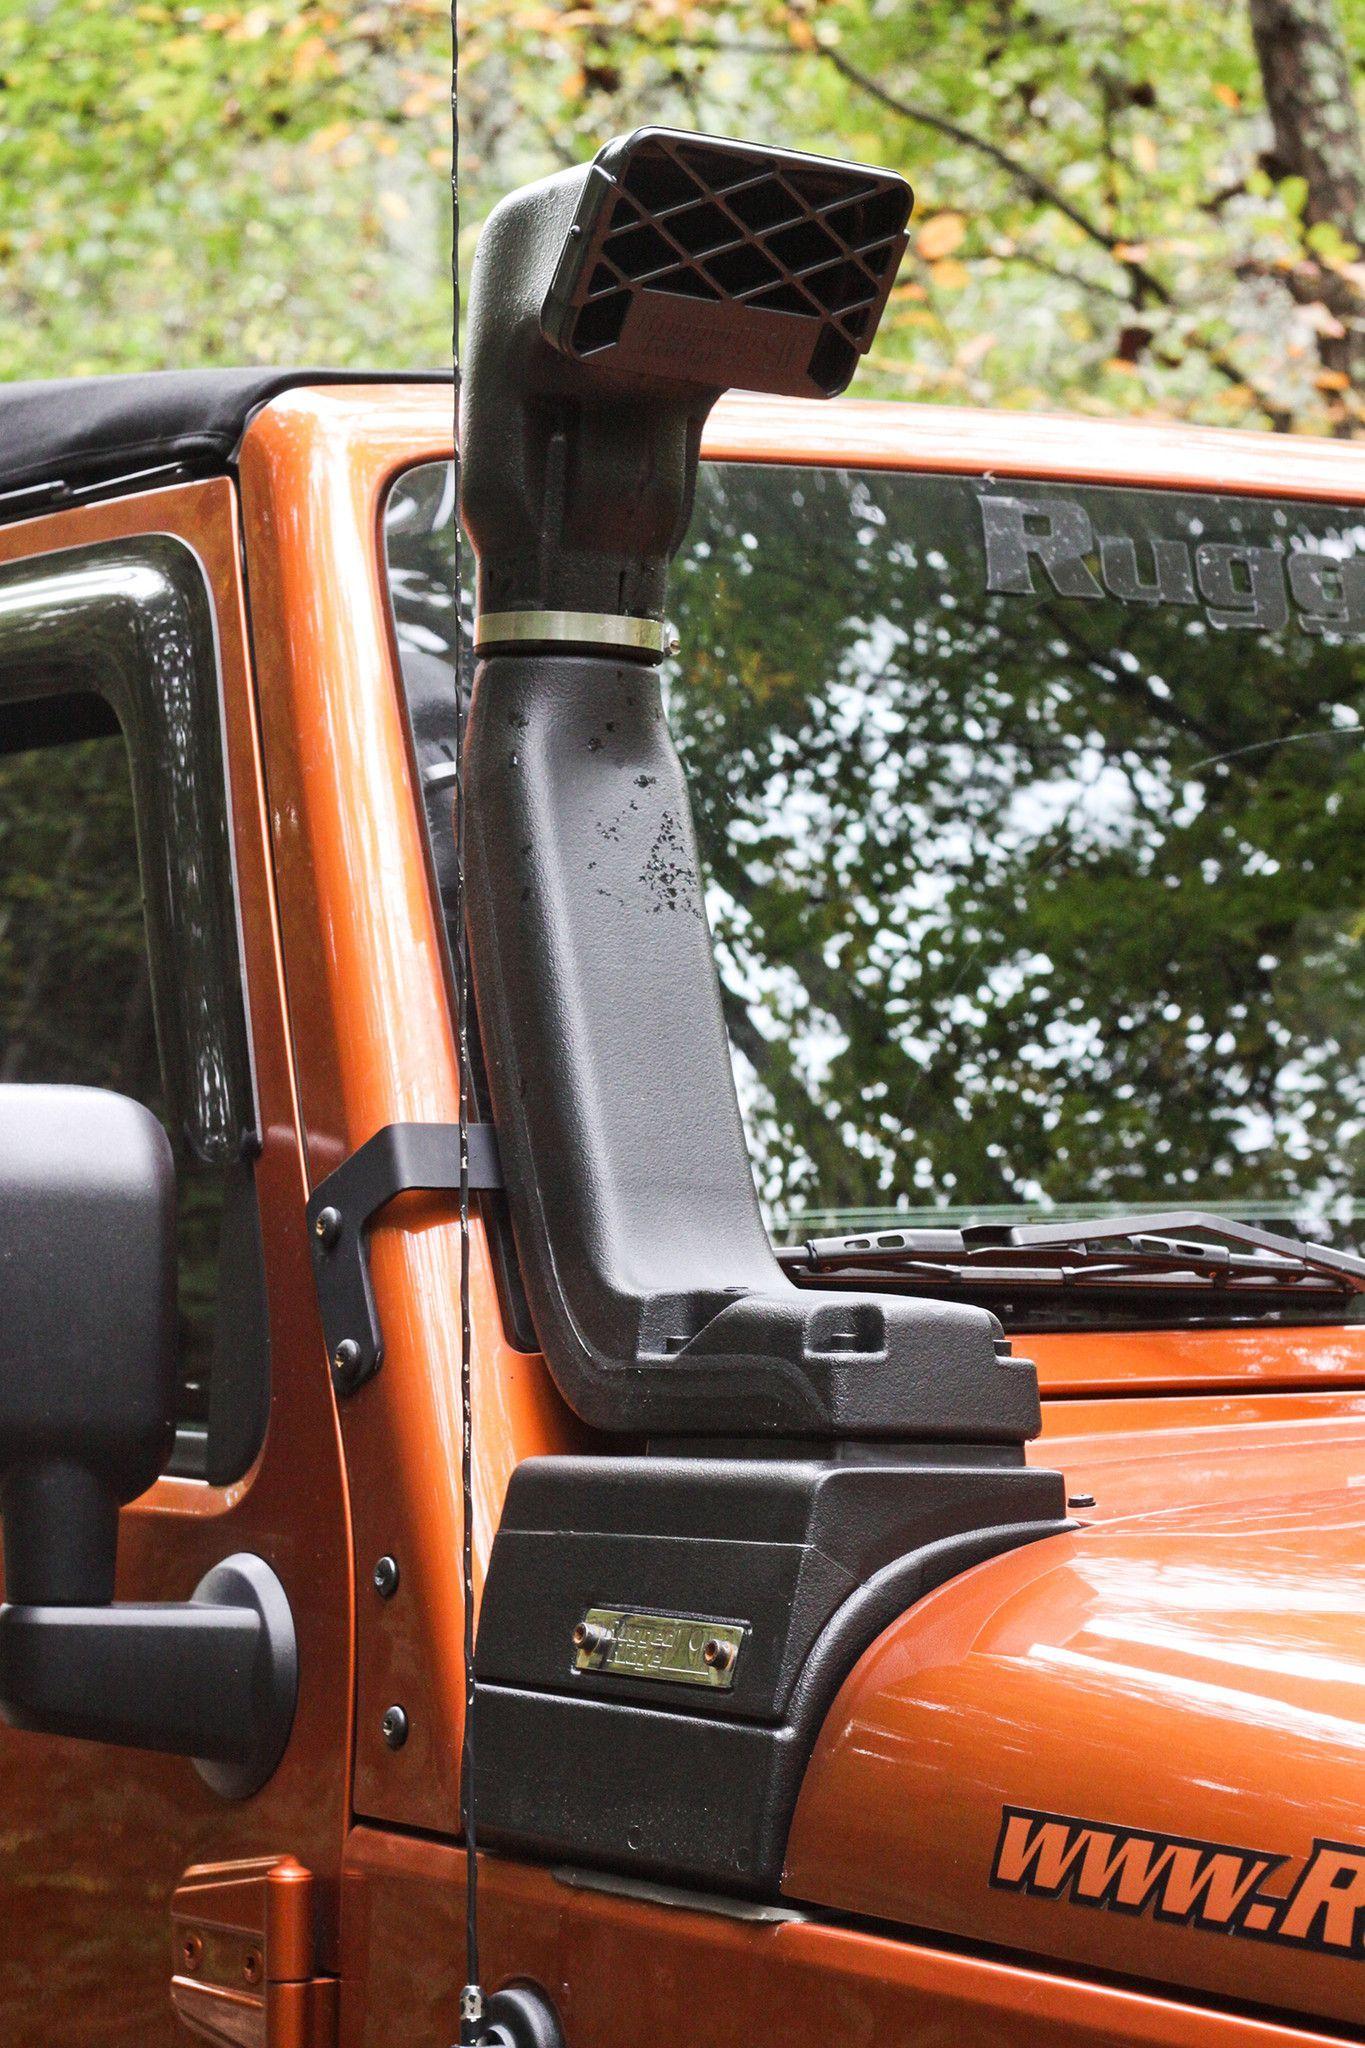 2013 jeep wrangler unlimited motor pinterest 2013 jeep wrangler unlimited 2013 jeep wrangler and 2013 jeep